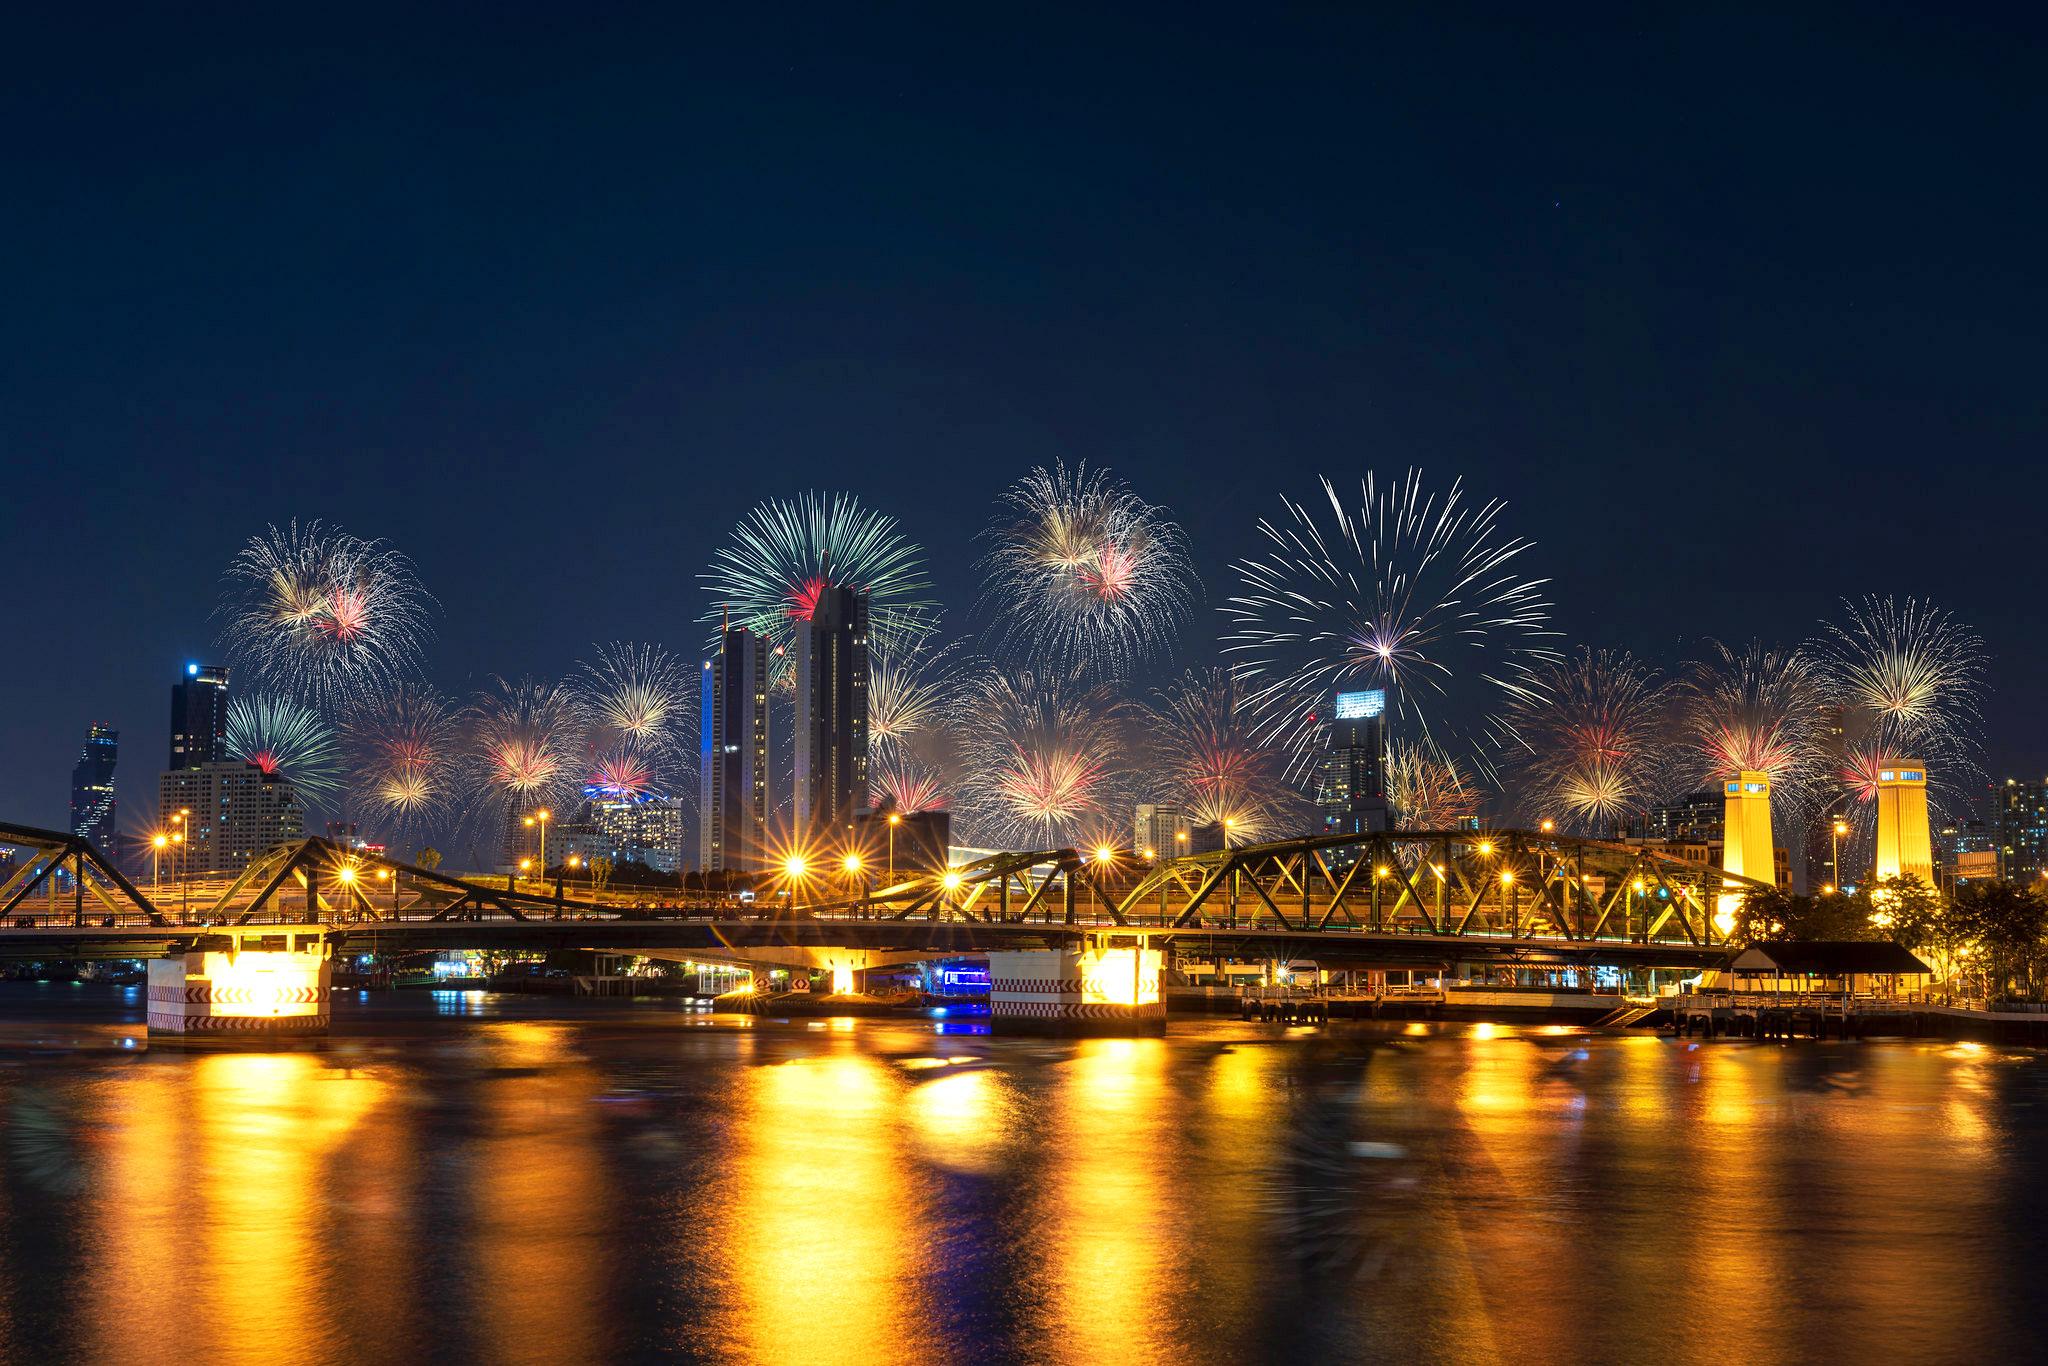 Firework New year Celebration at the Phra Phuttha Yodfa Bridge, Memorial Bridge 2021 by Thirawatana Phaisalratana.jpg